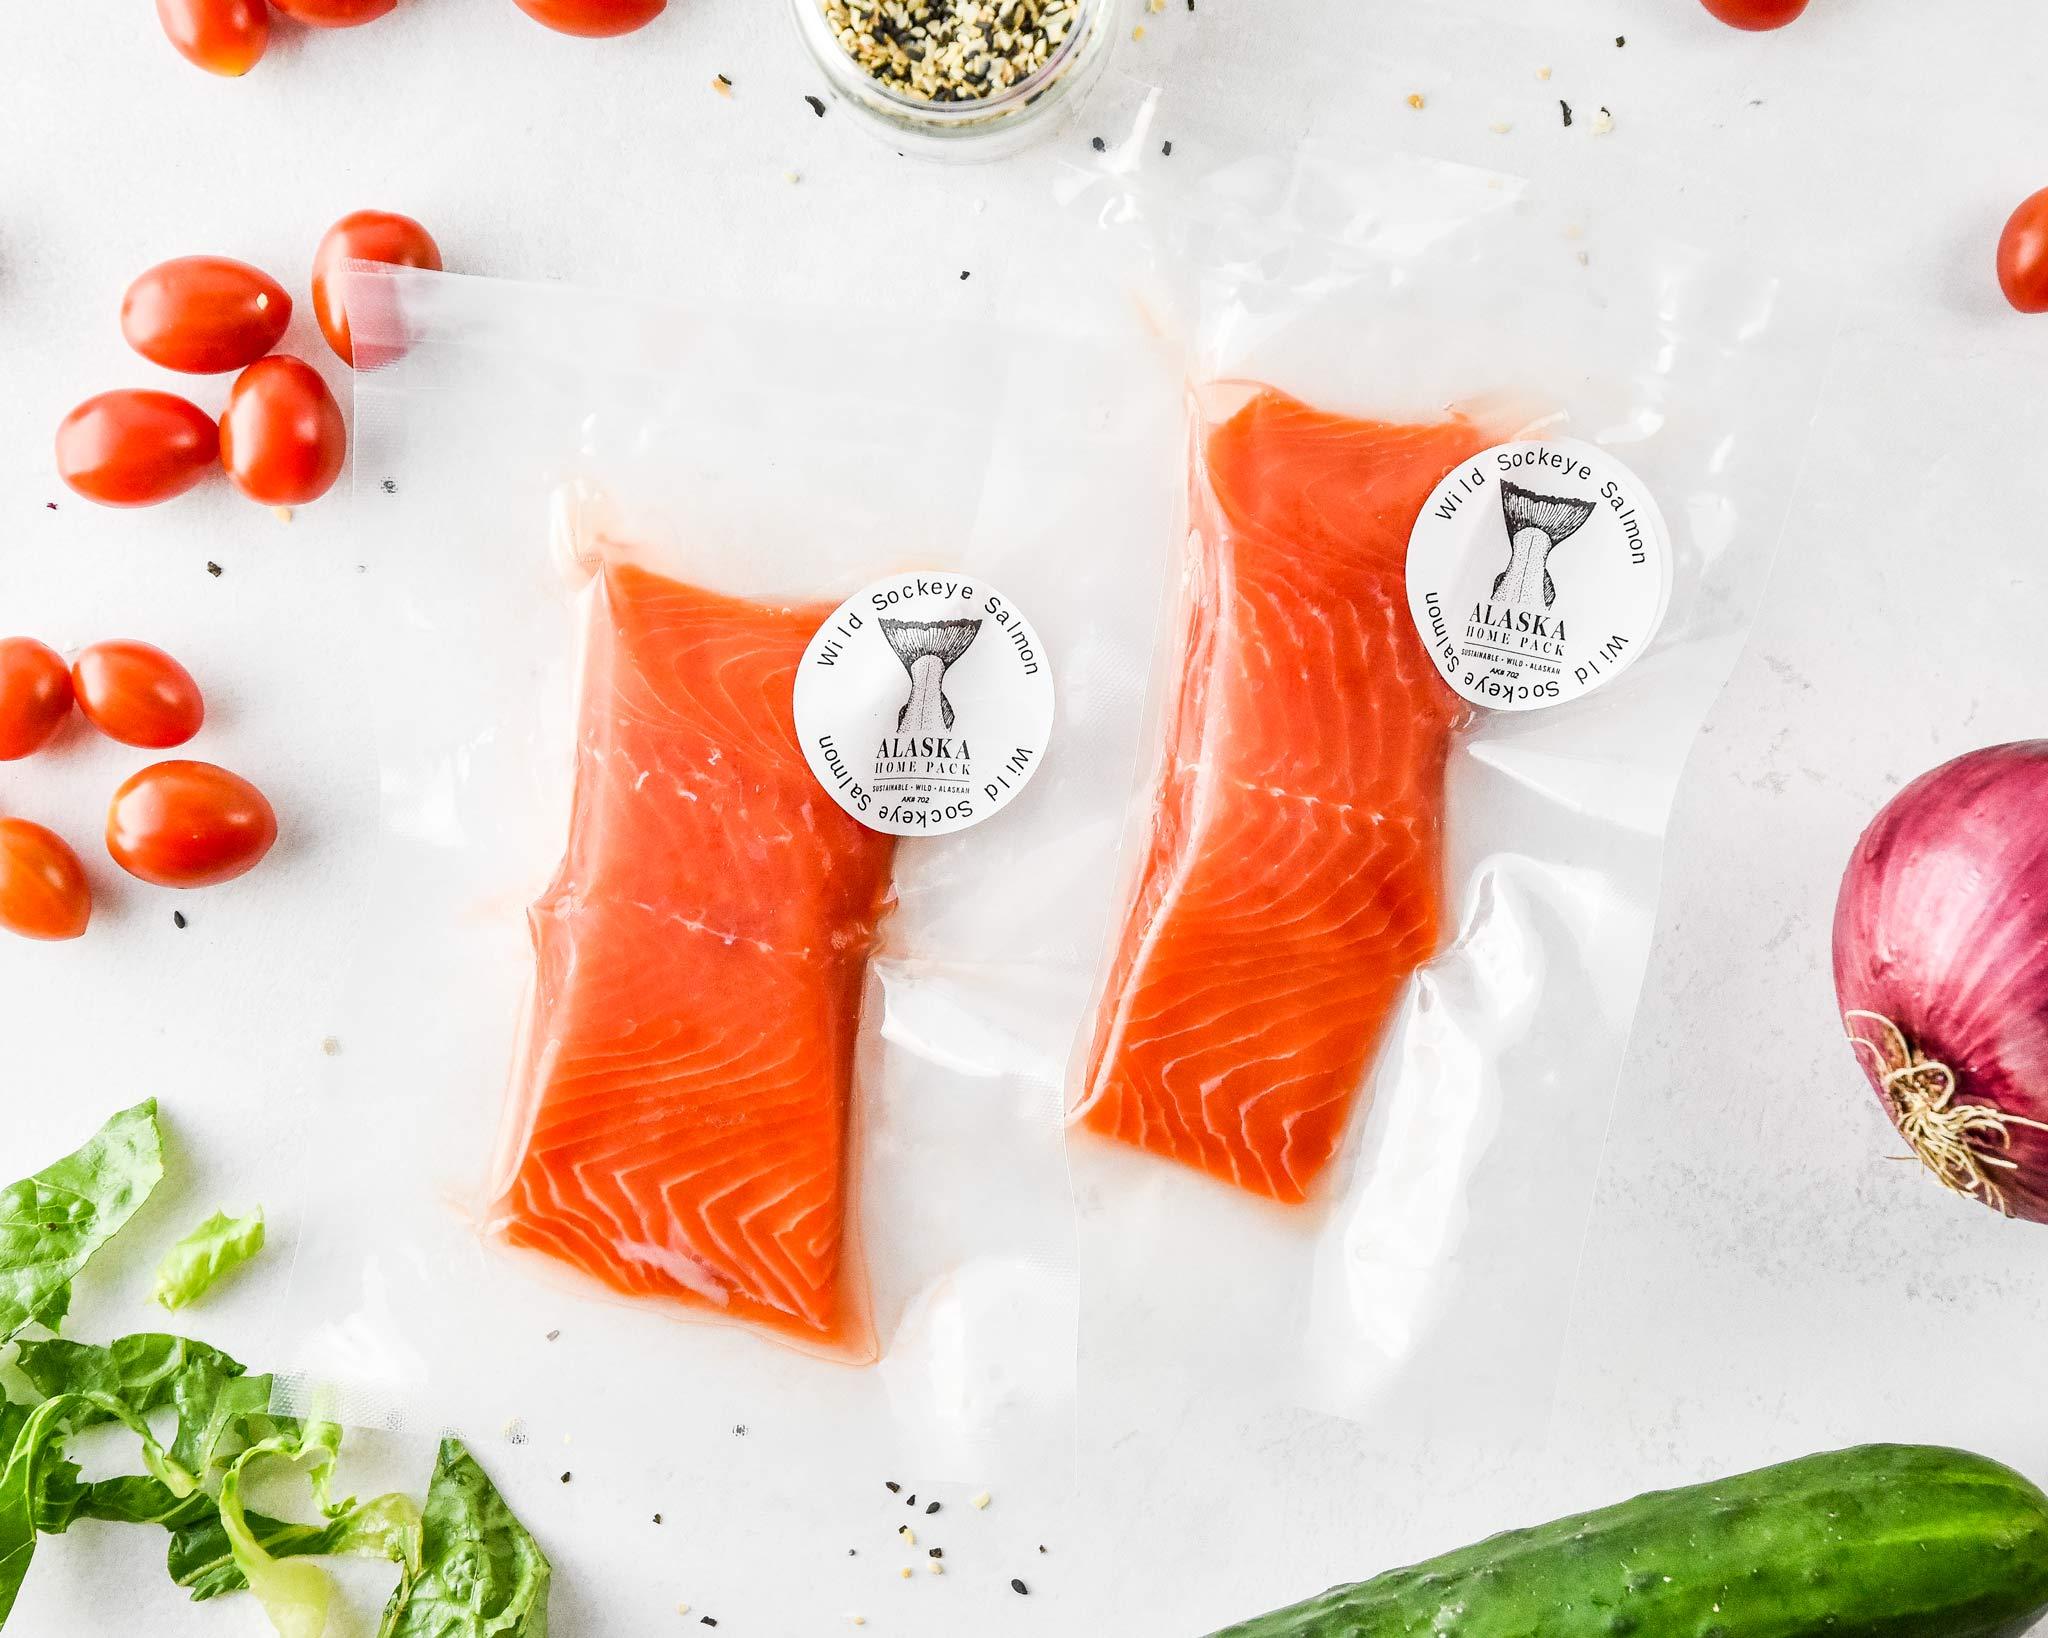 wild sockeye salmon filets for the everything bagel salmon salad bowls